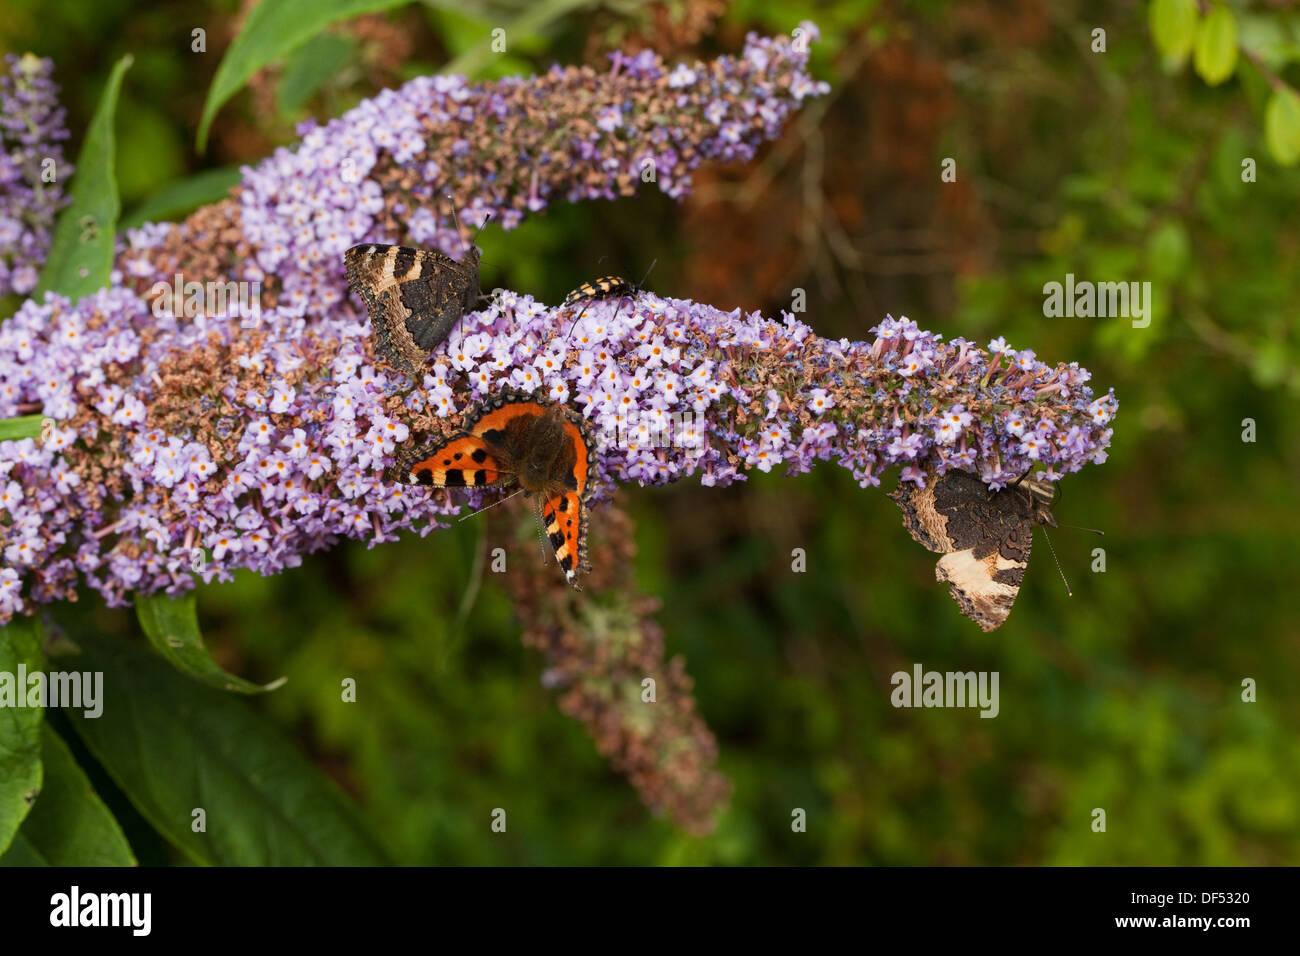 Small Tortoiseshell Butterflies (Aglais urticae). Taking nectar from garden flowers of Buddleia bush (Buddleja daviddii). - Stock Image